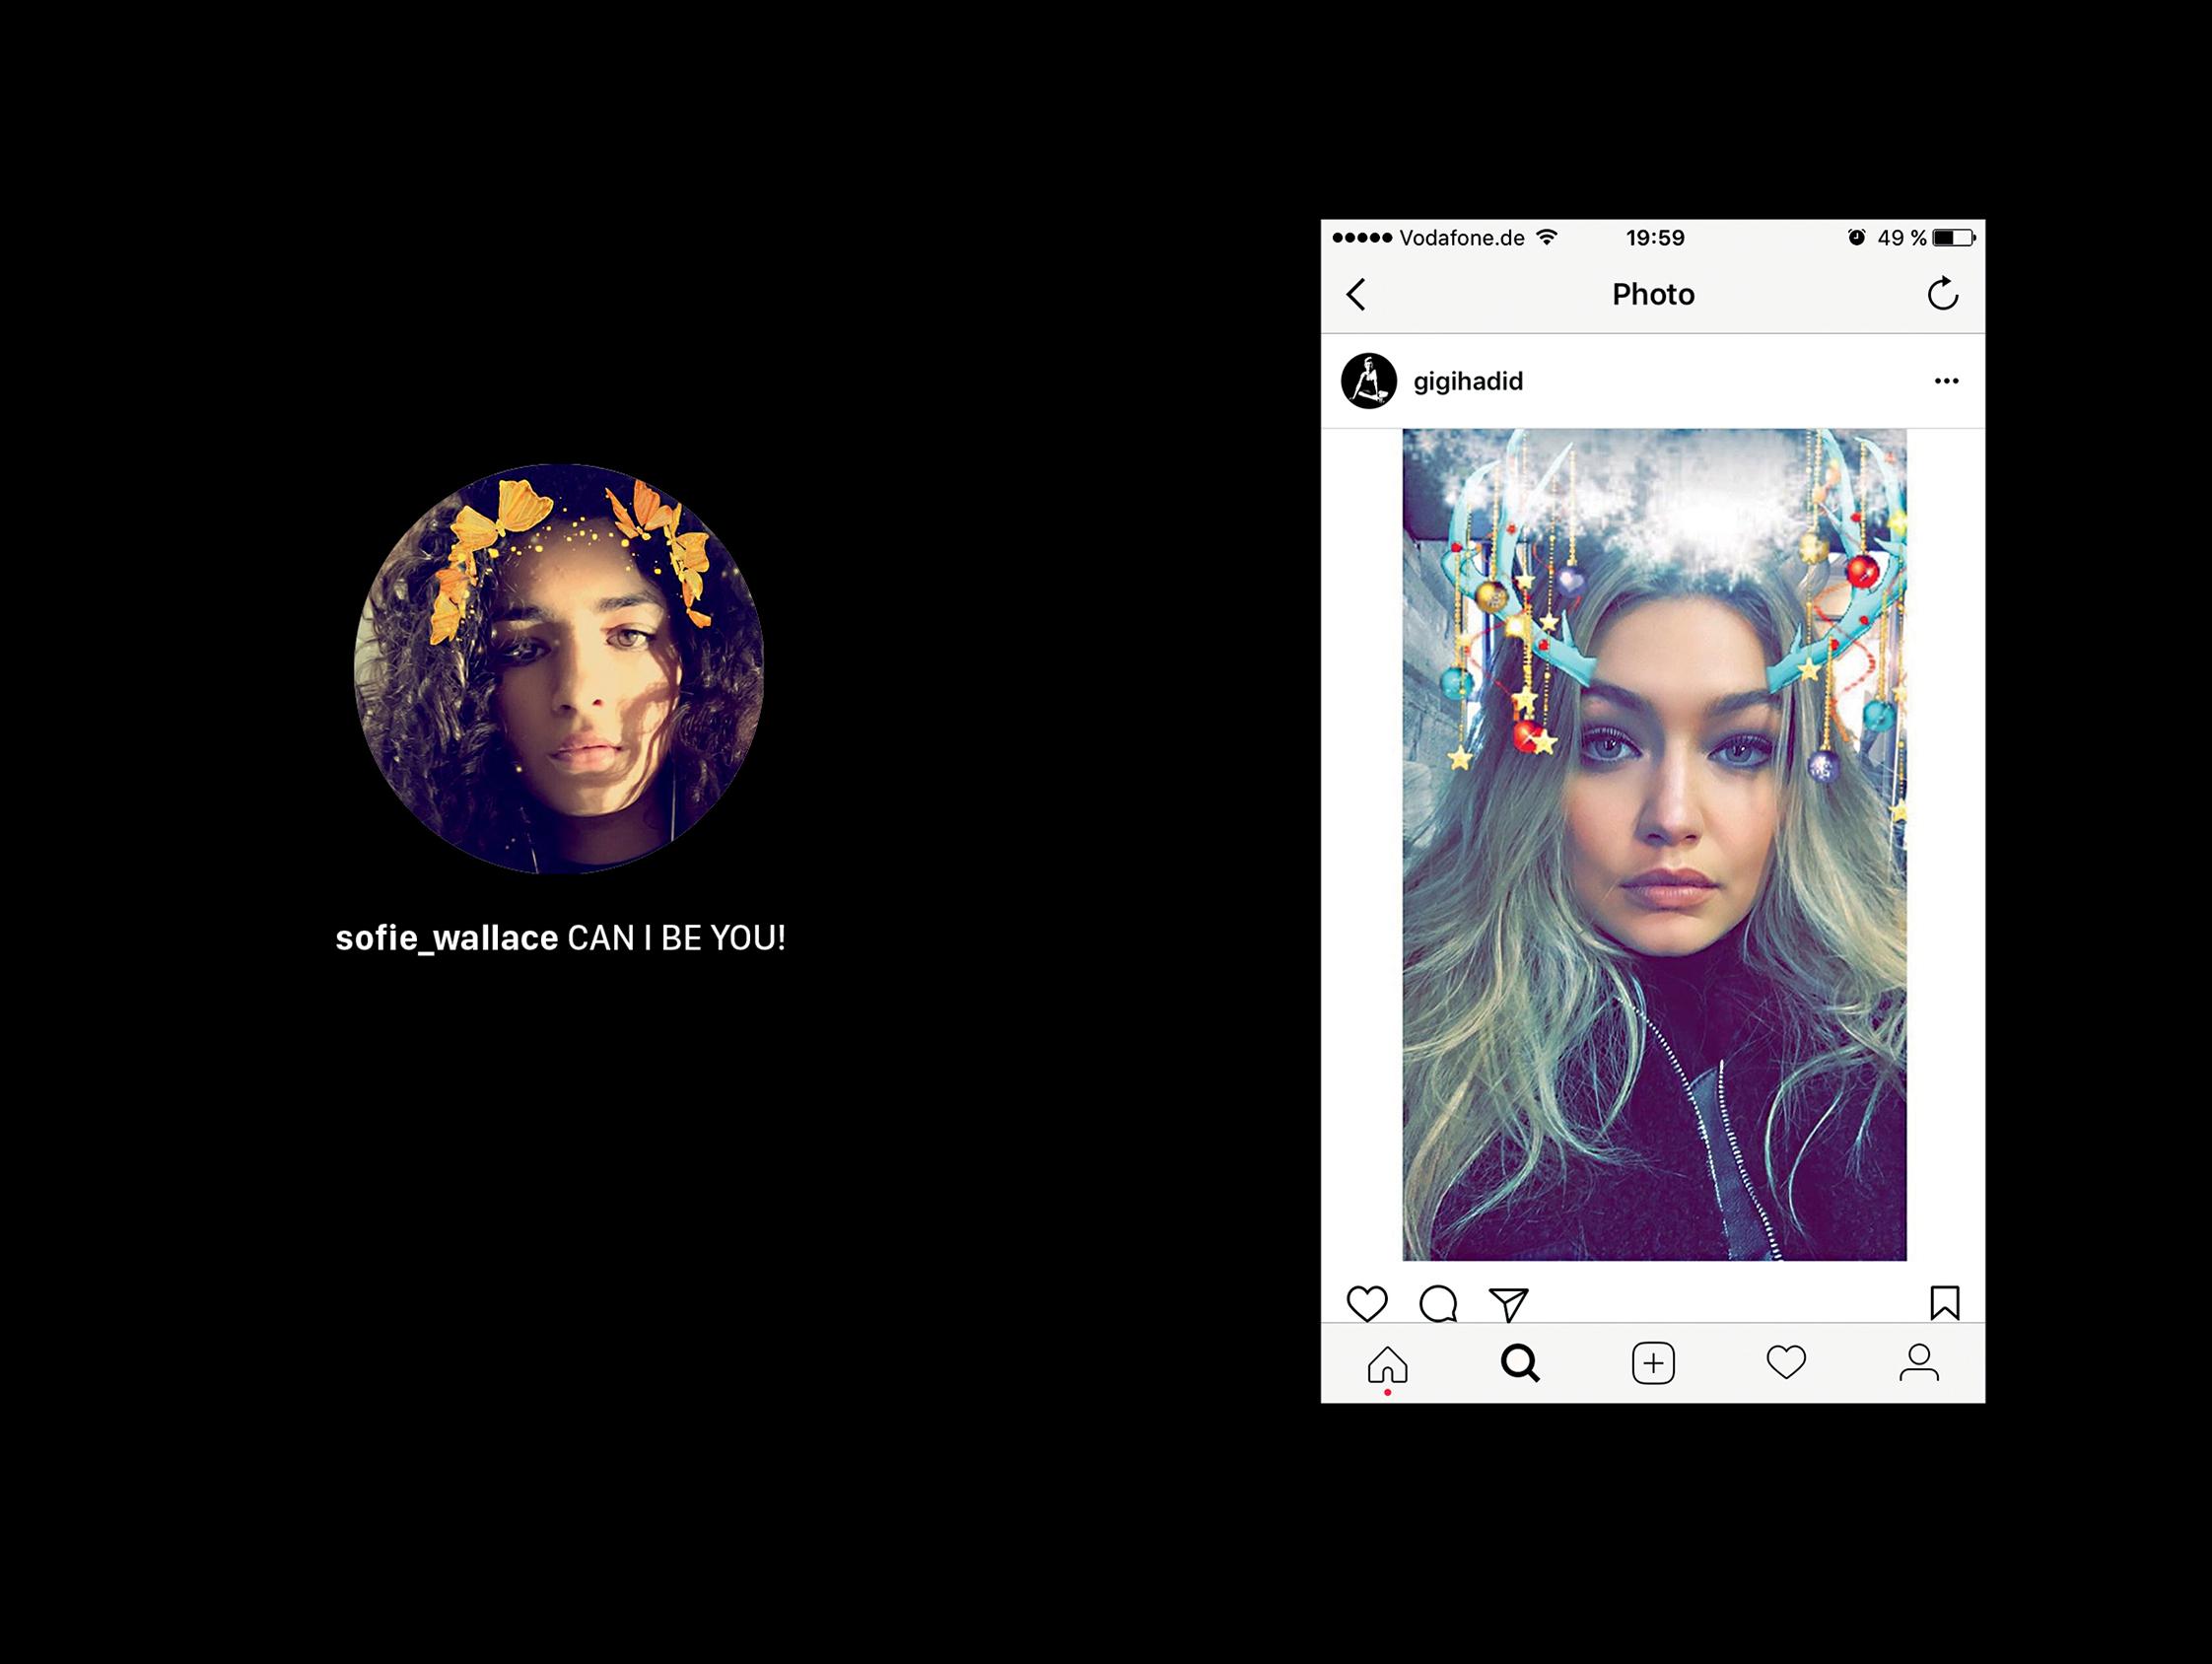 GIGI HADID, Instagram, selfie, art, appropriation, influencer, follow, follower, comment, emoji, beauty, worship, photography, book, RELICS, Hatje Cantz, © 2017 Chris Drange